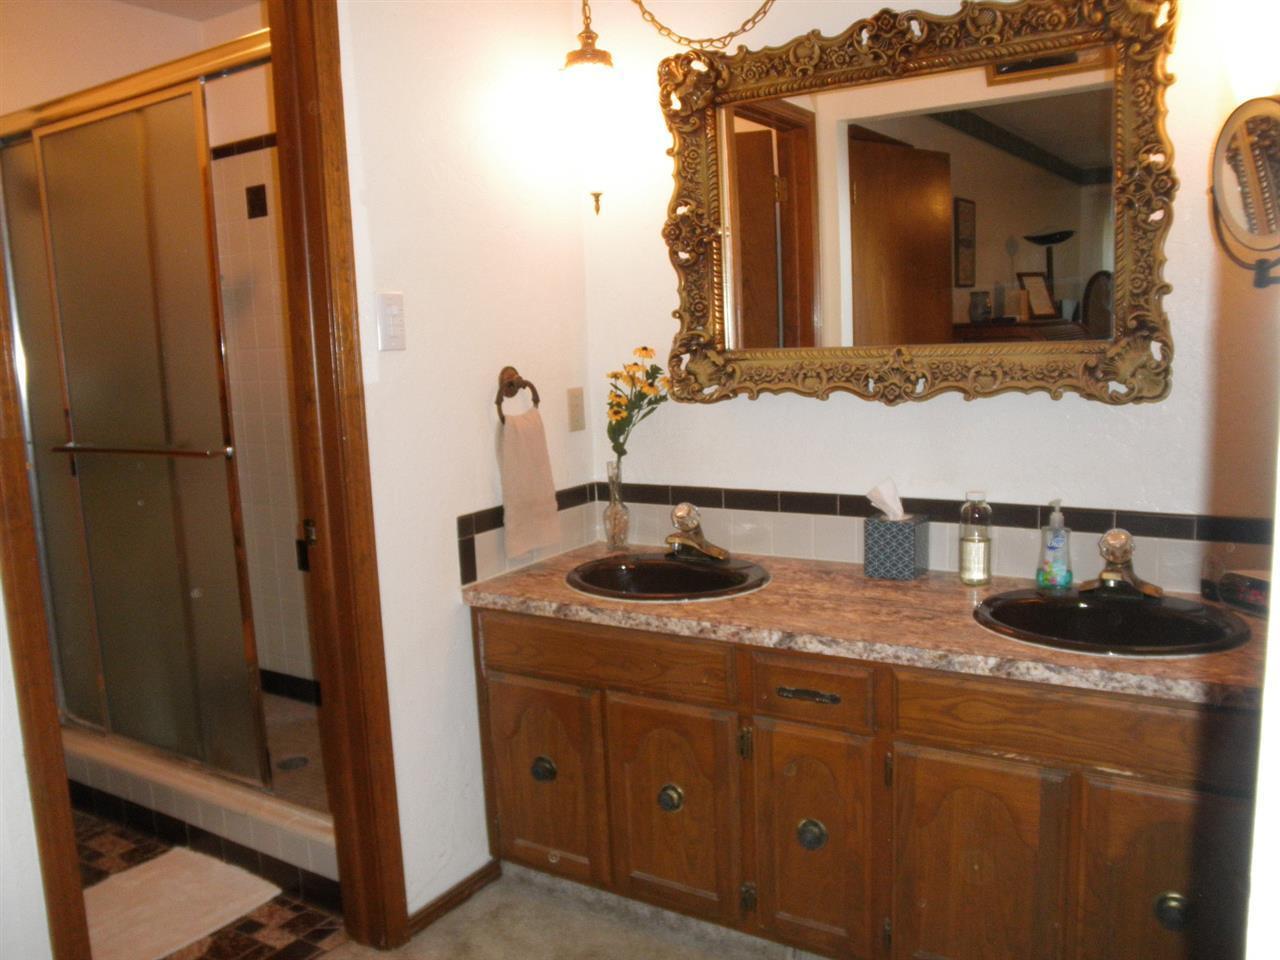 Sold Cross Sale W/ MLS | 1275 S Enterprise Road  Ponca City, OK 74604 13